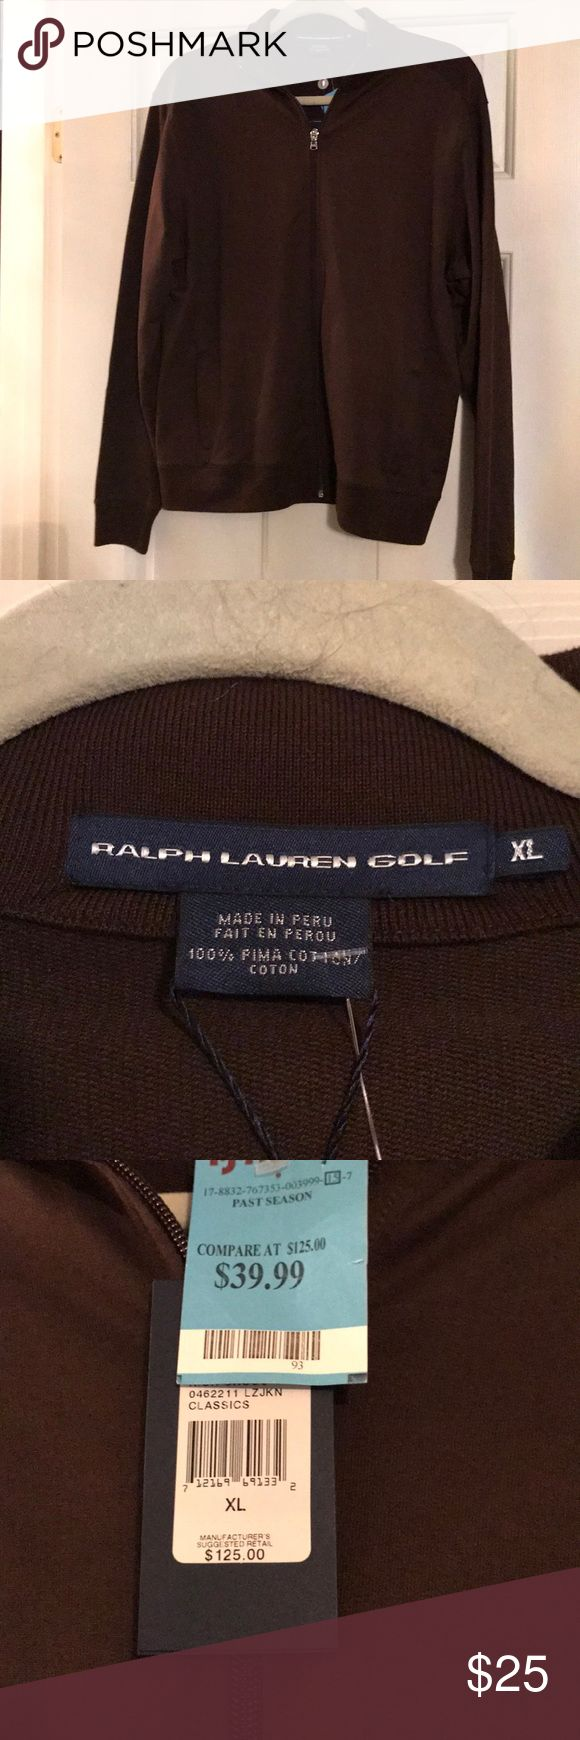 NWT Ralph Lauren Golf Zip Up. New with Tags Ralph Lauren chocolate brown zip up. Size XL. Polo collar. 100% Pima cotton. Ralph Lauren Jackets & Coats